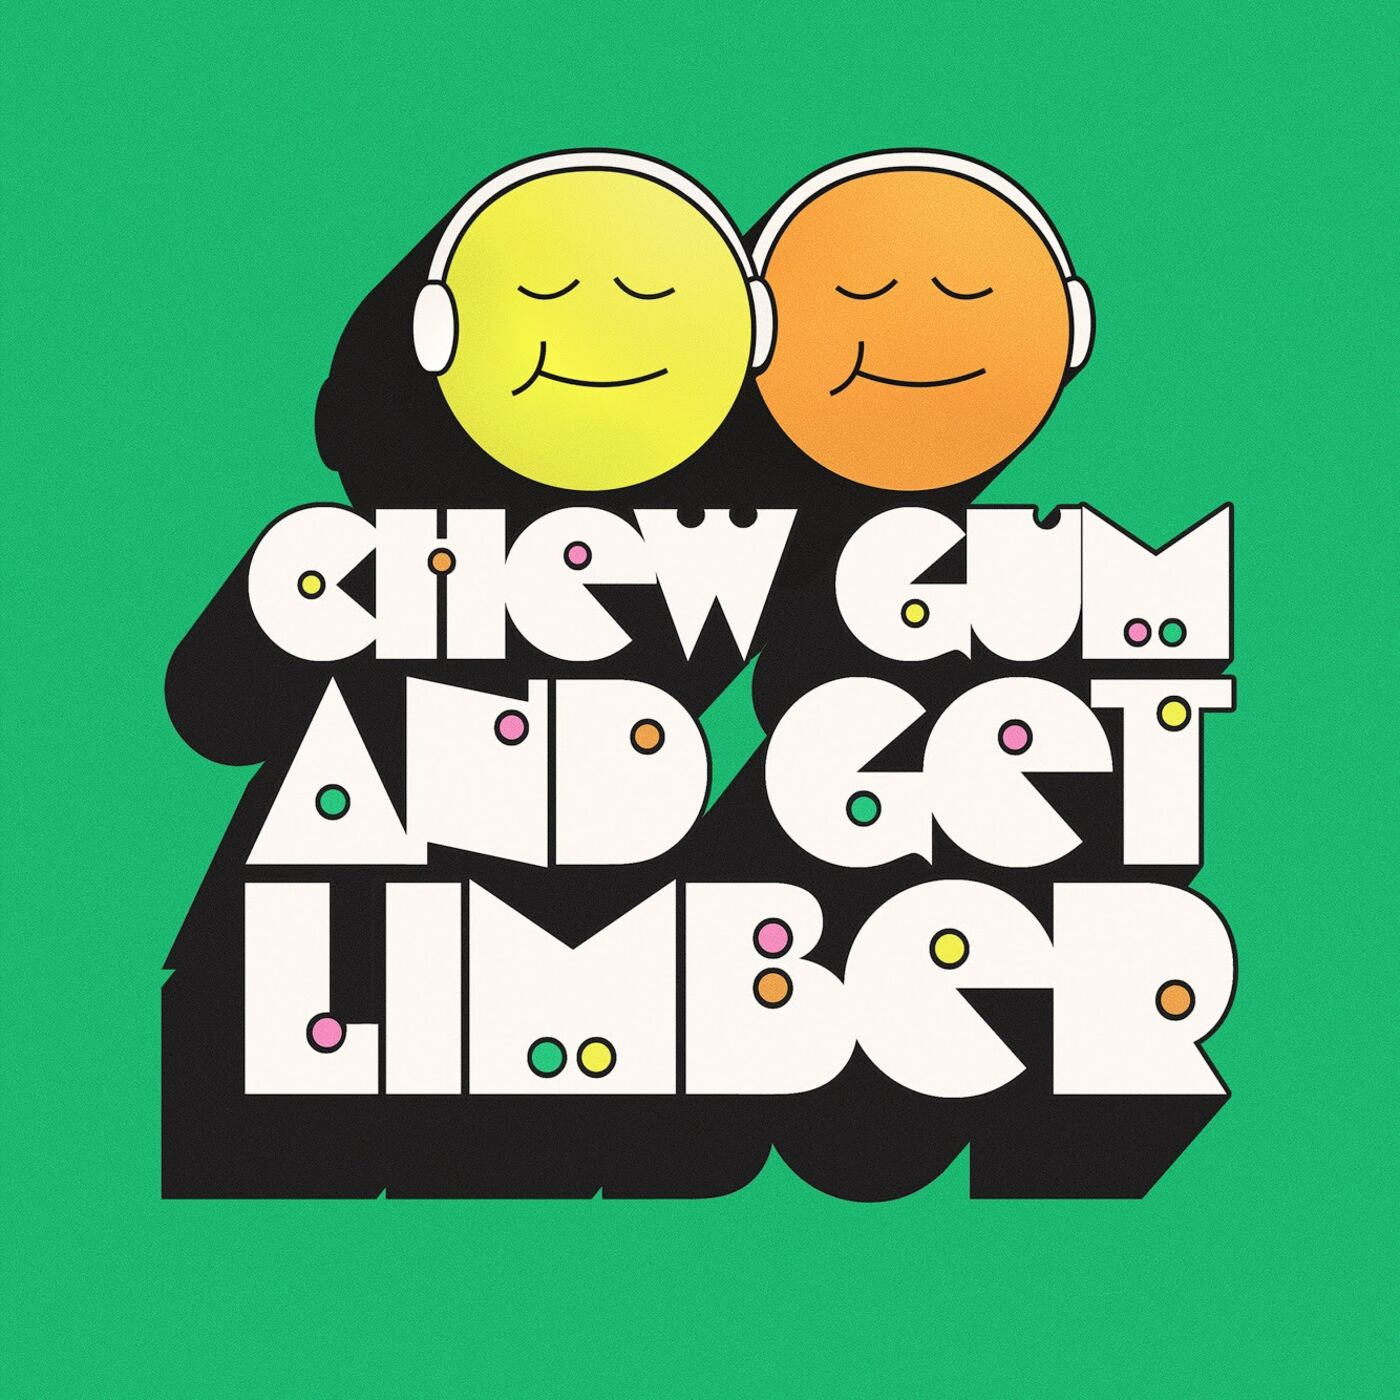 Chew Gum & Get Limber